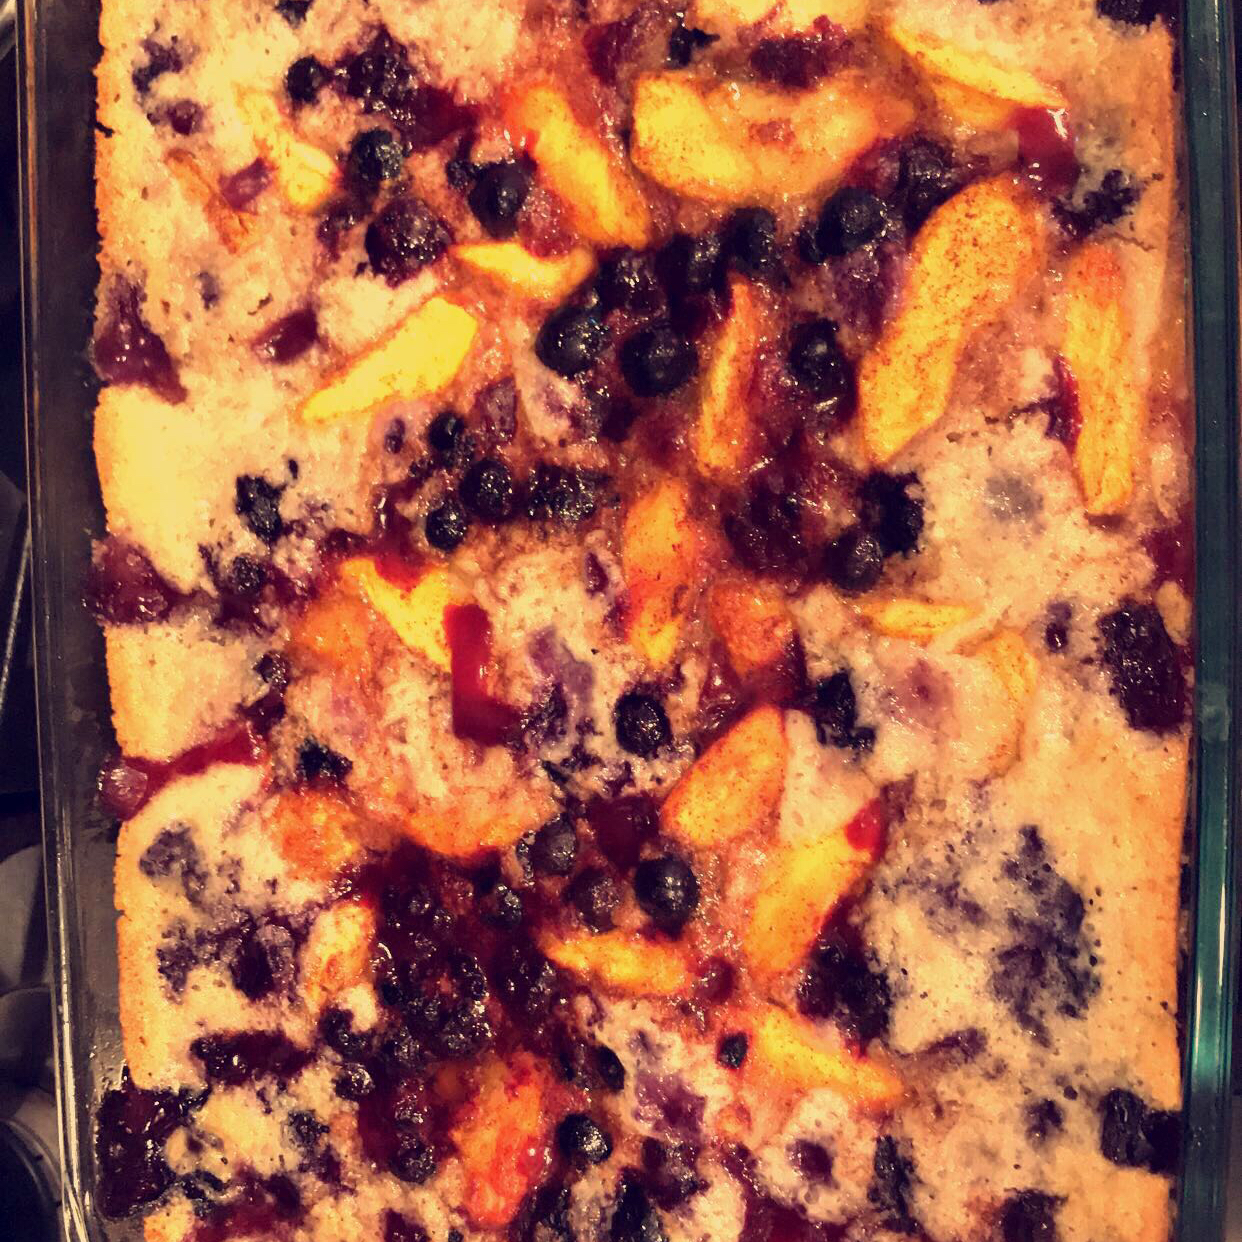 Peach and Blackberry Cobbler